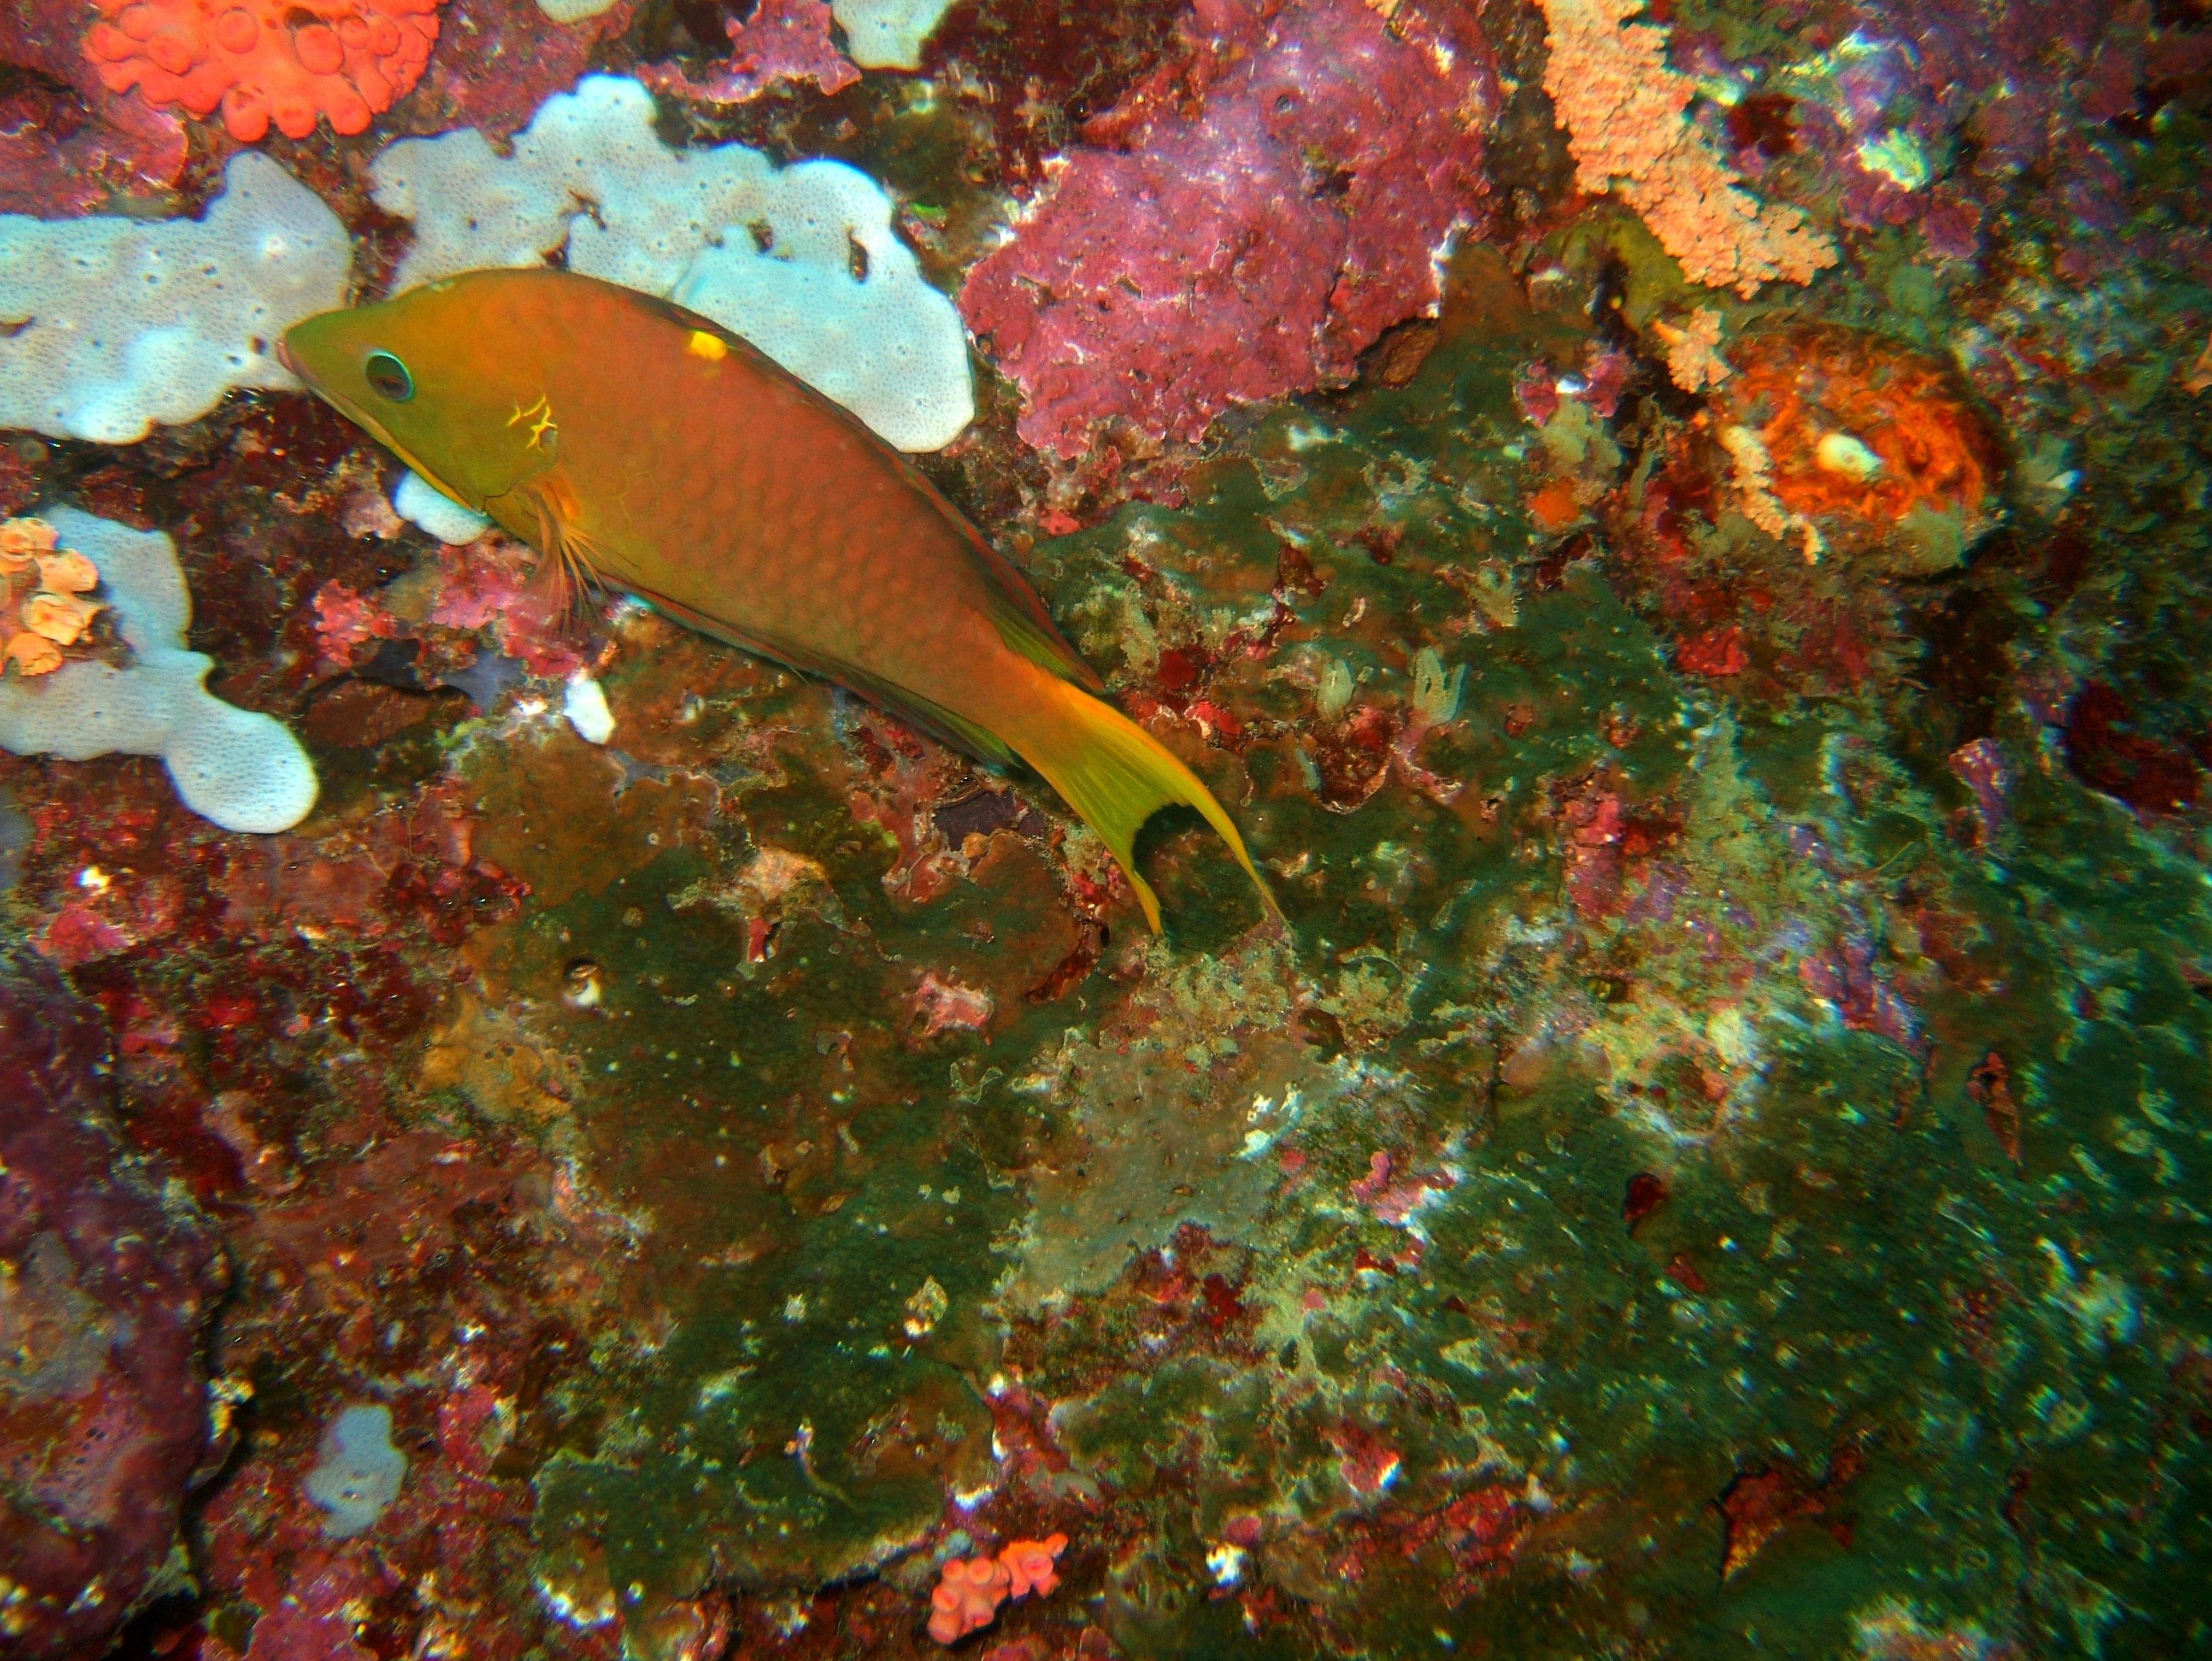 Philippines Cebu Moal Boal 20051227 Dive 1 Pescador Island 63